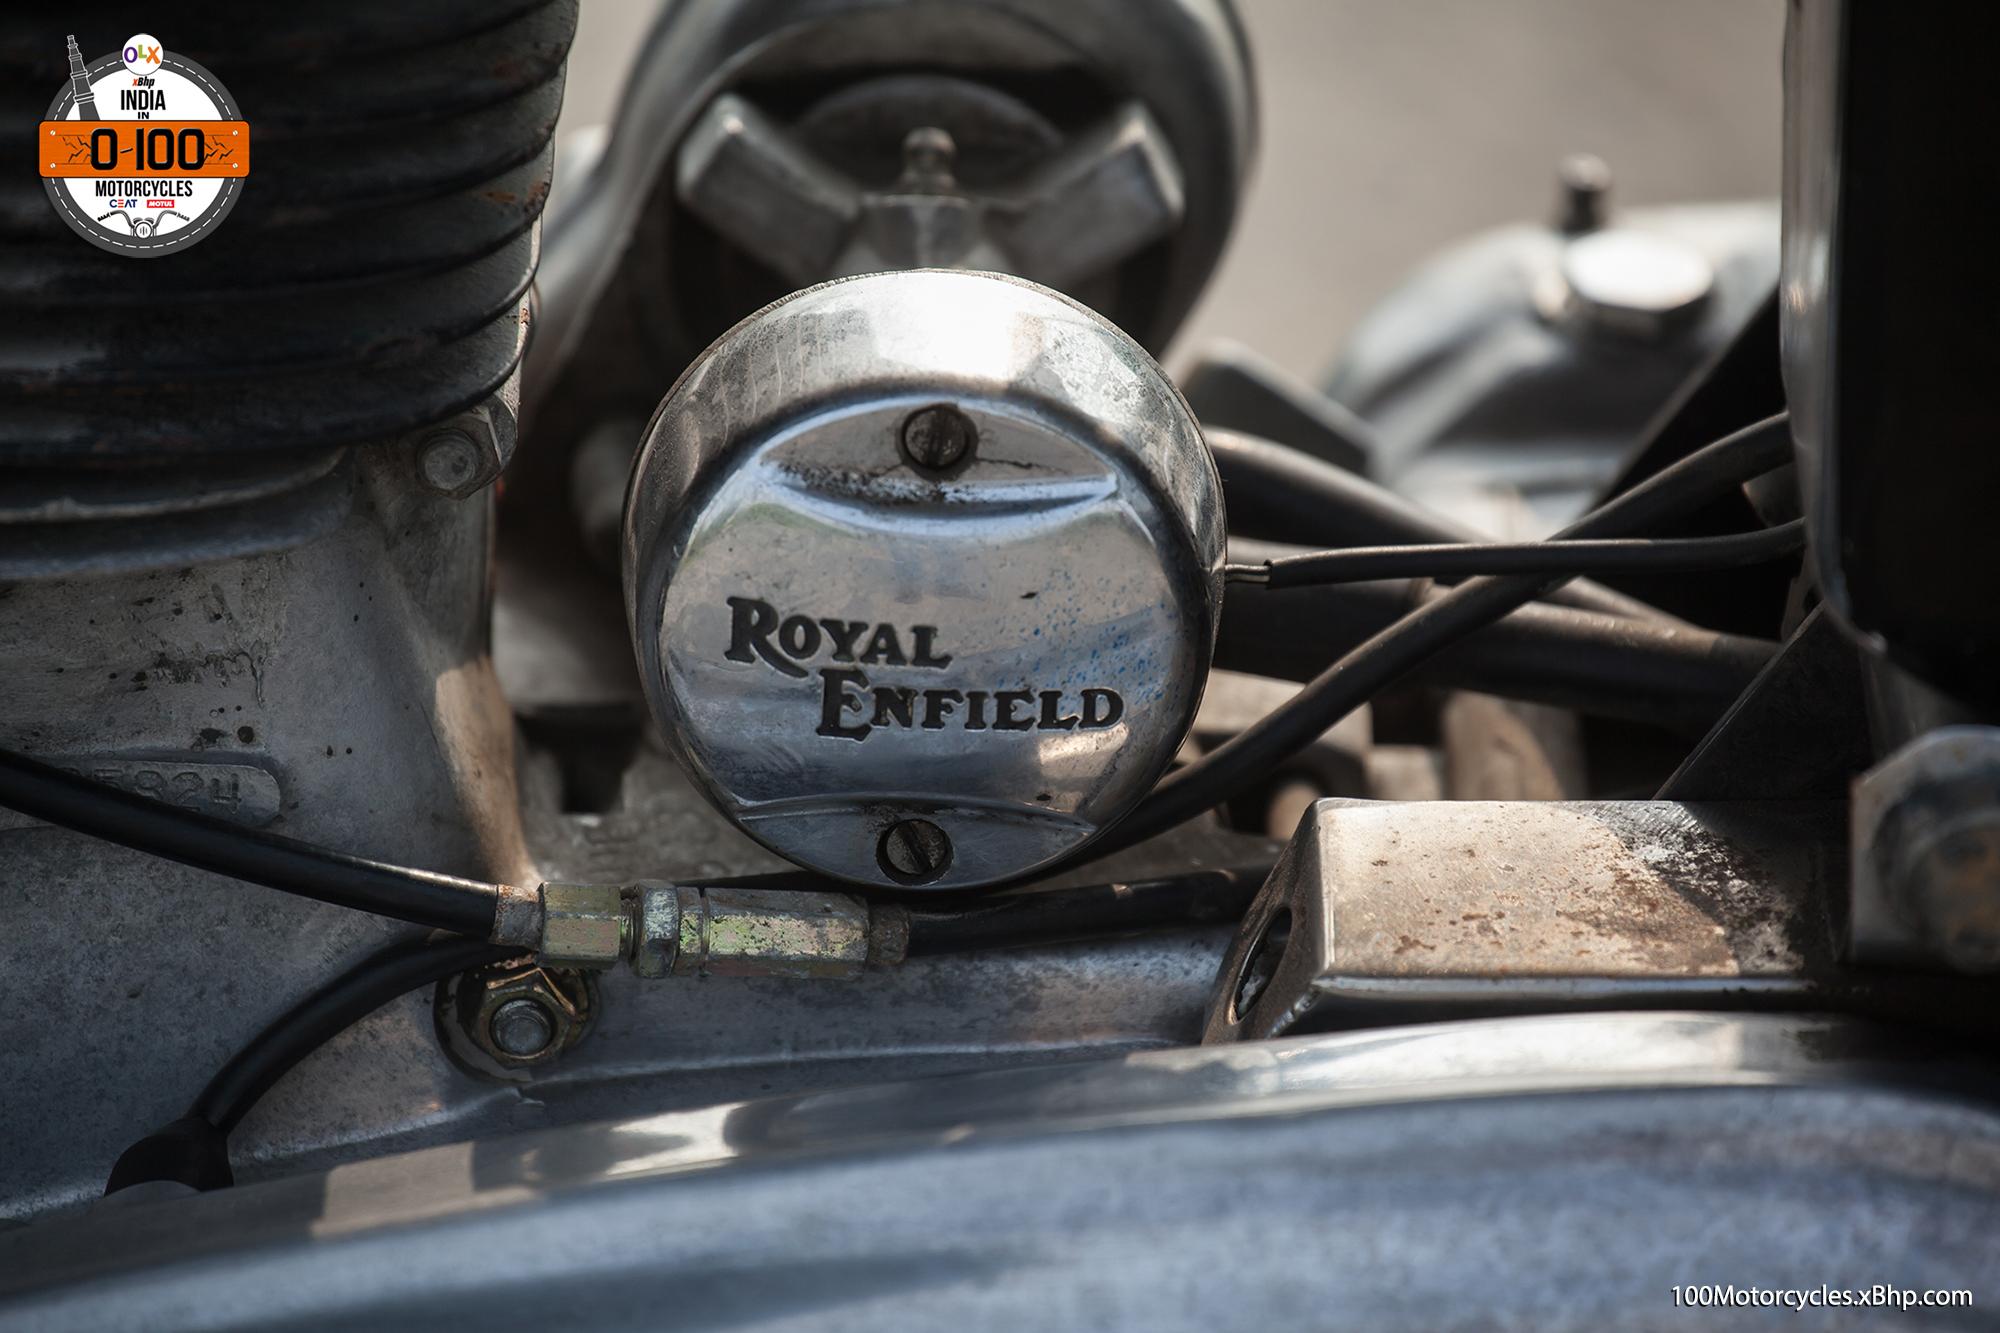 Bike #94: Royal Enfield Bullet Cast Iron - Thumping away